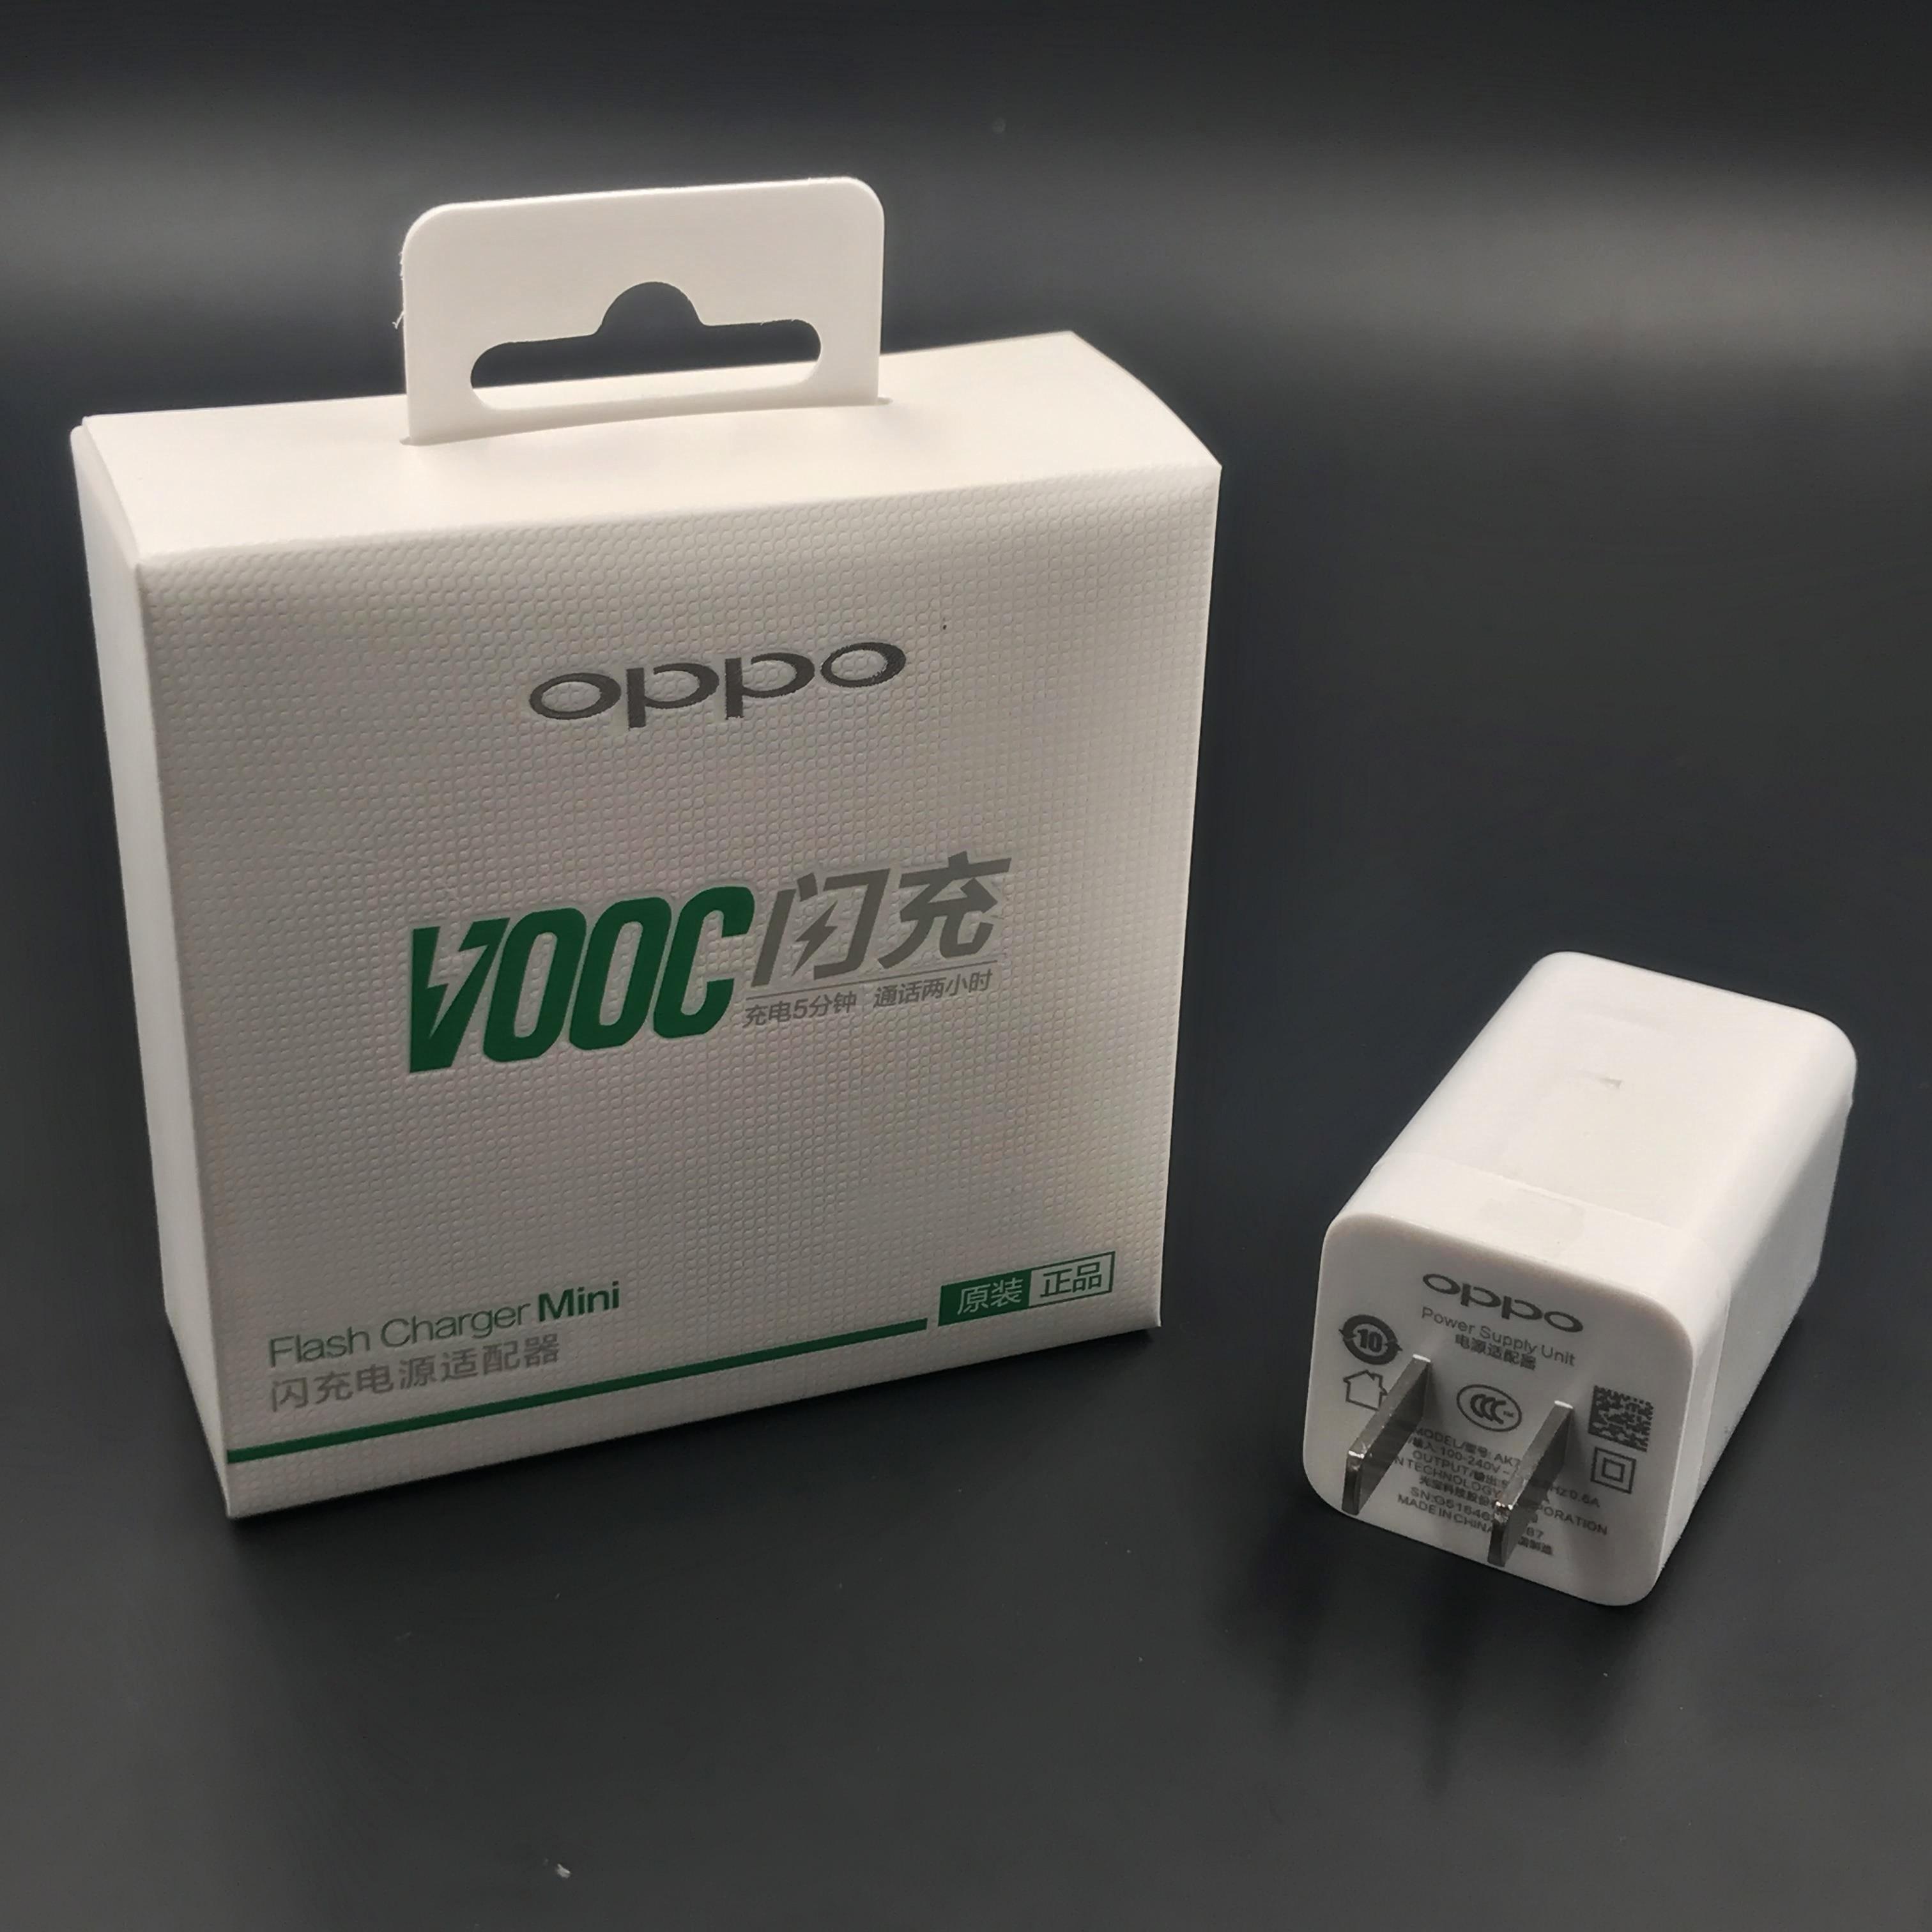 3C安全保护!防过充充电器5v2a安卓数据线通用快速手机快充套装。